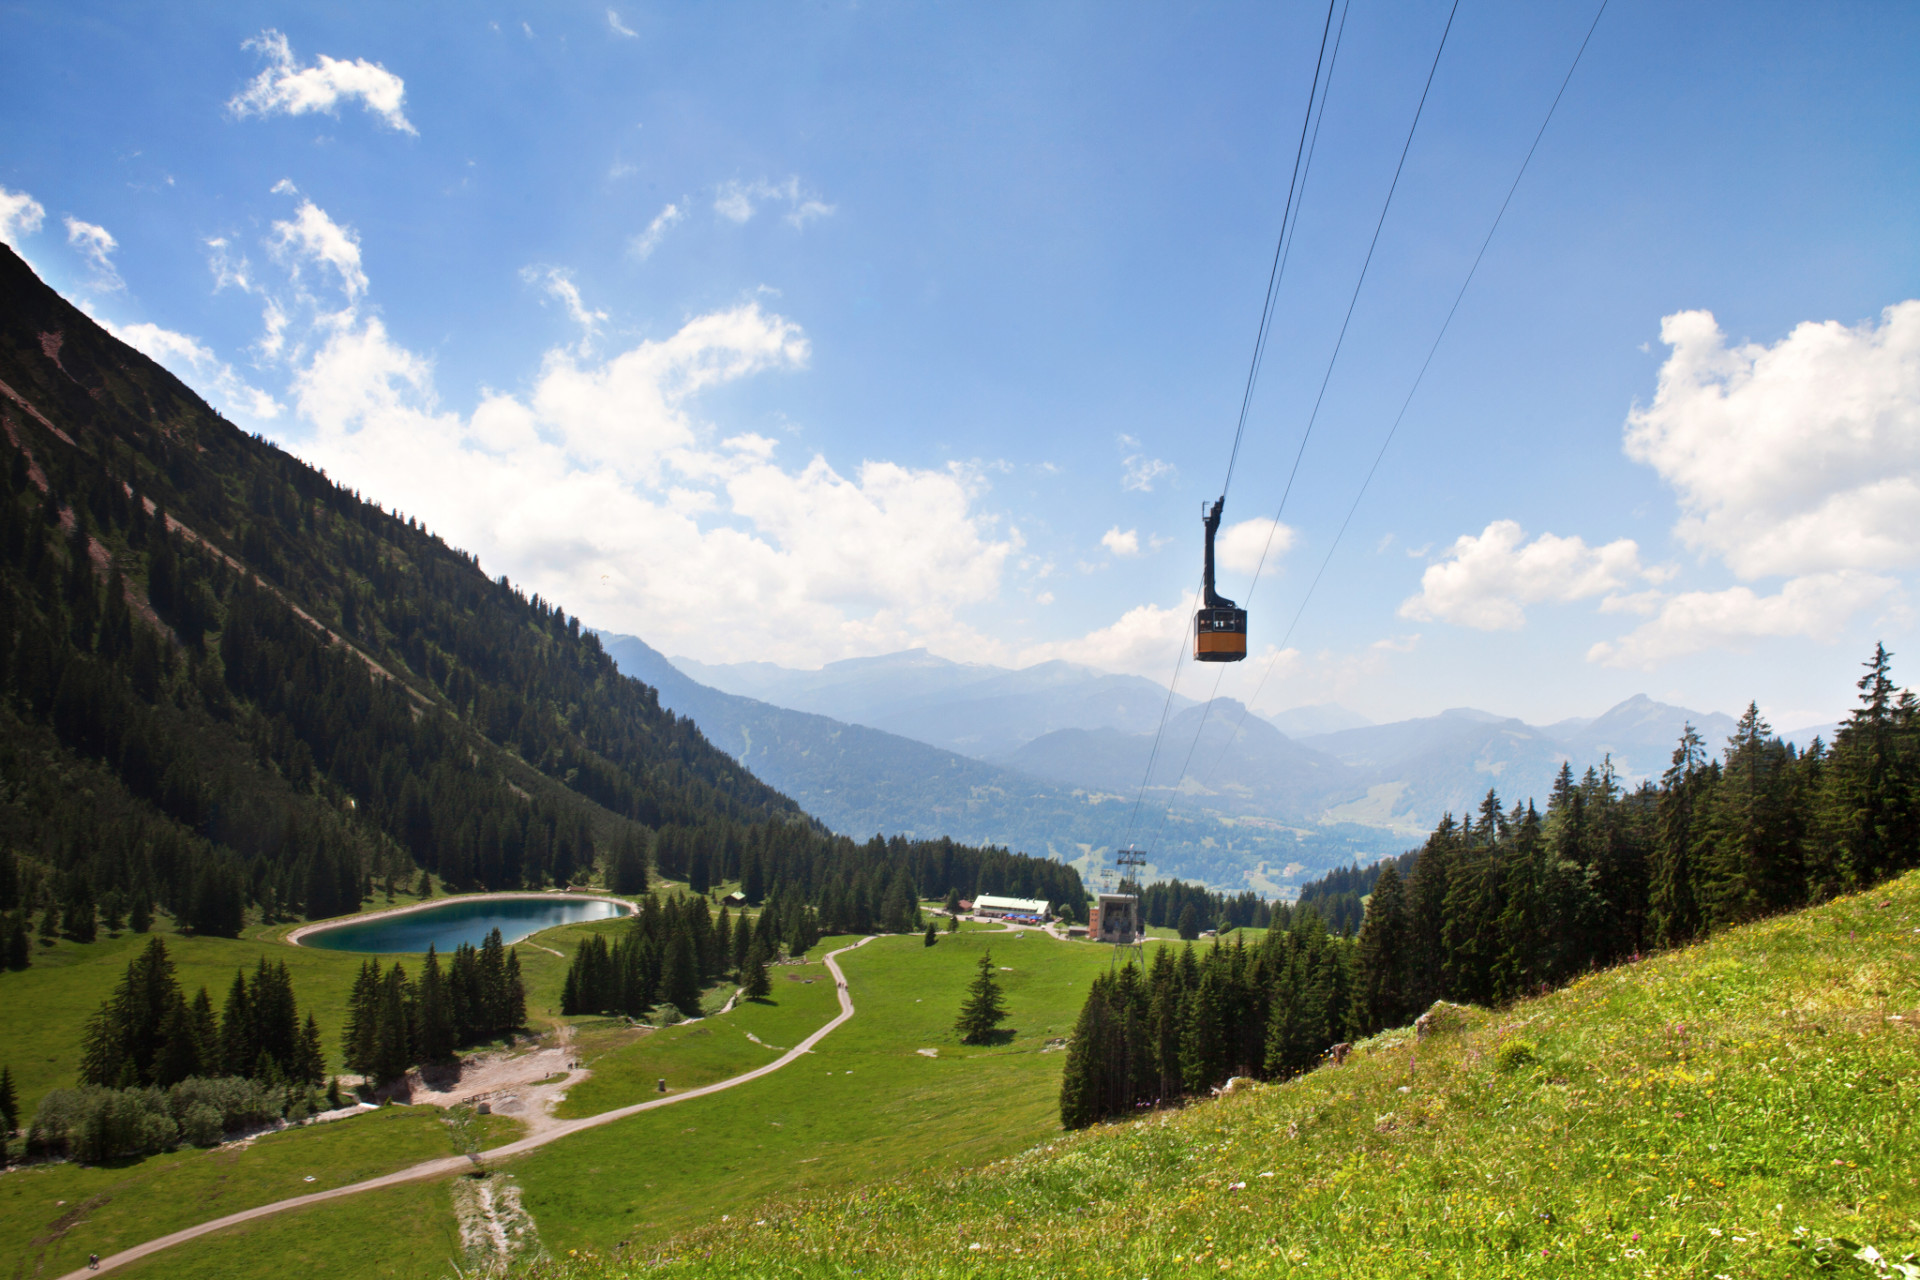 Wandern im Allgäu - Alpen Nebelhorn